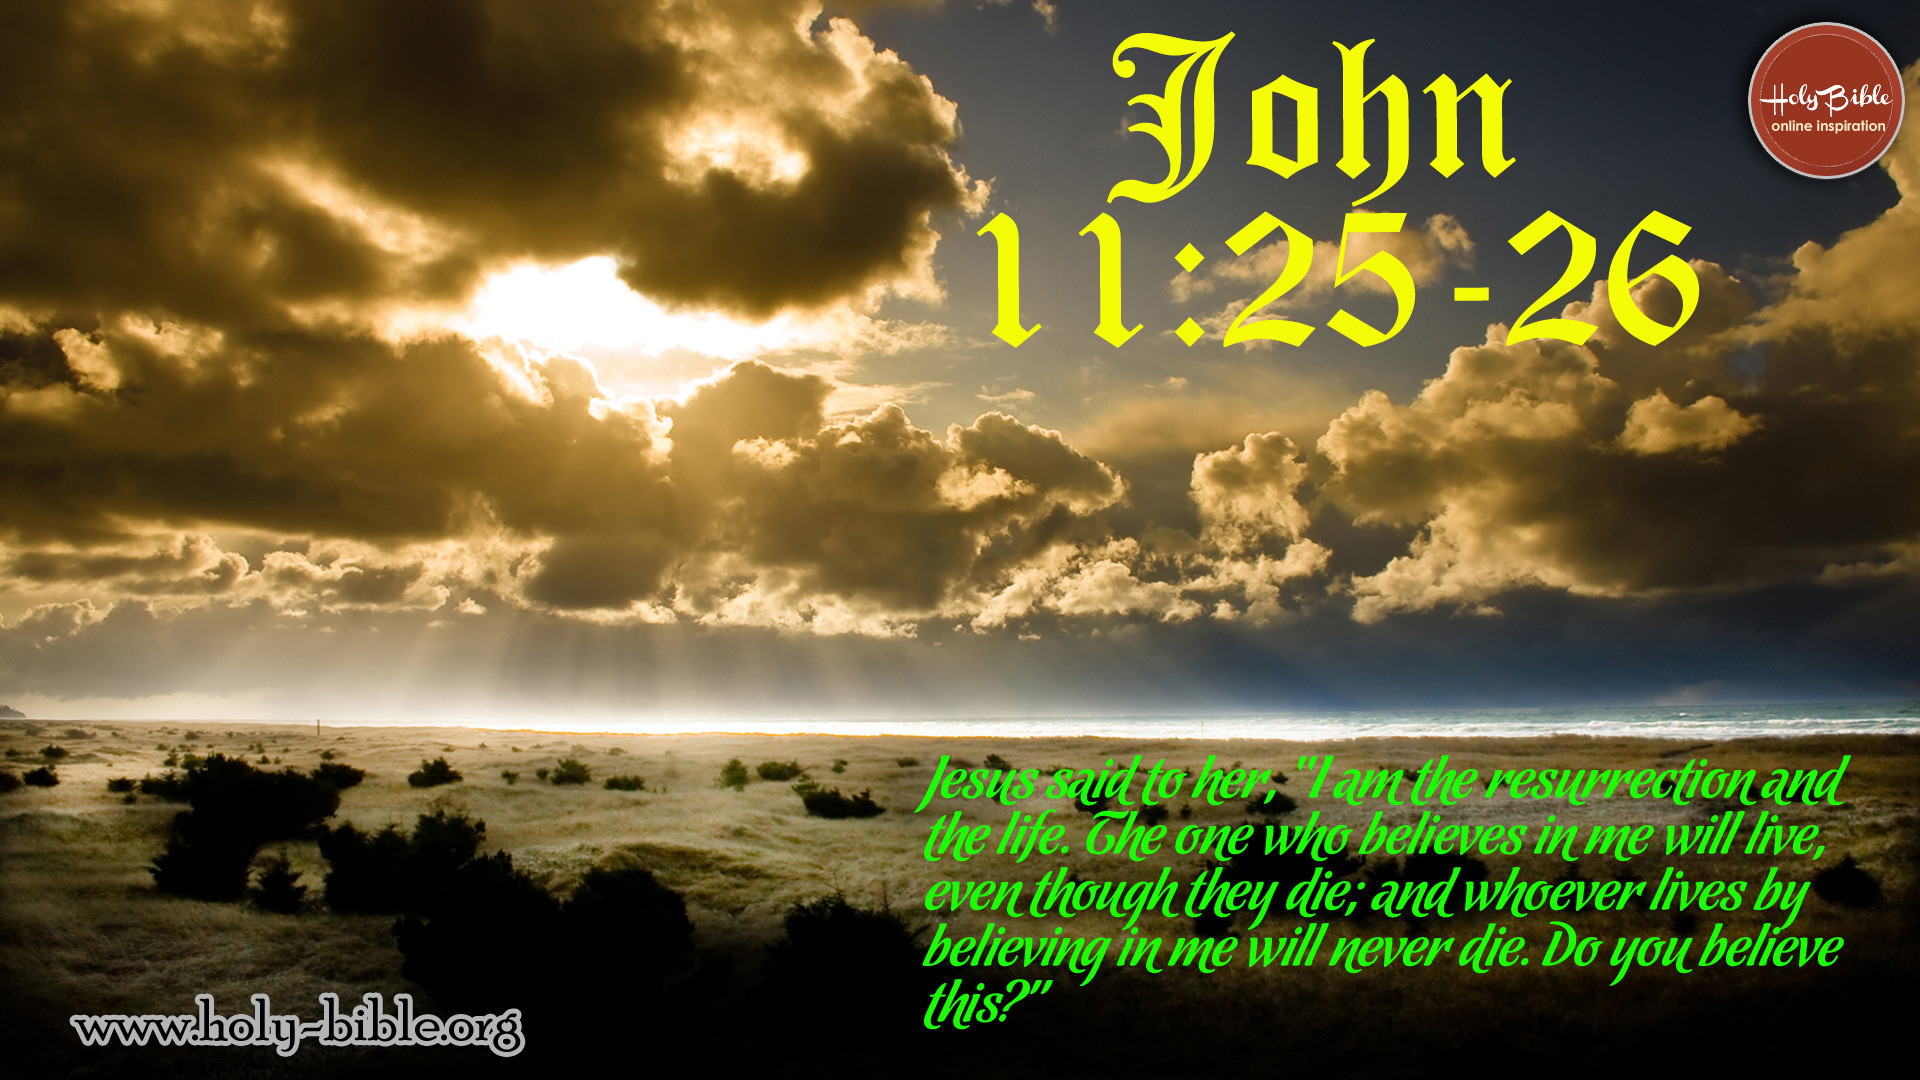 Inspirational Bible Verses Wallpaper ·① WallpaperTag